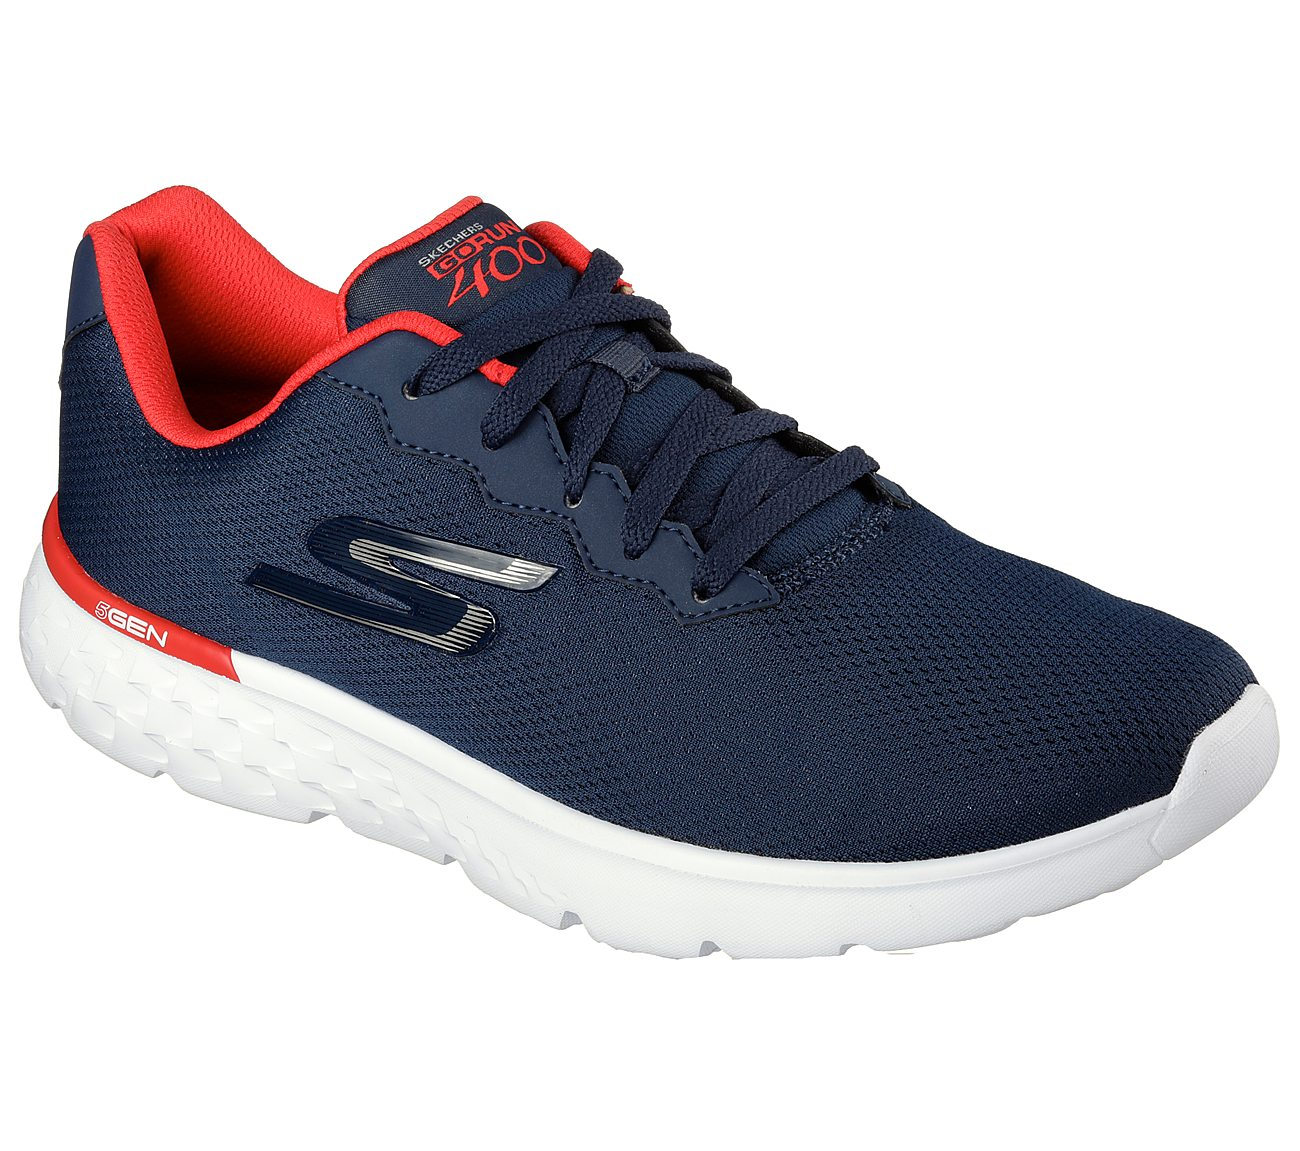 Buy Skechers Skechers Gorun 400 Skechers Performance Shoes